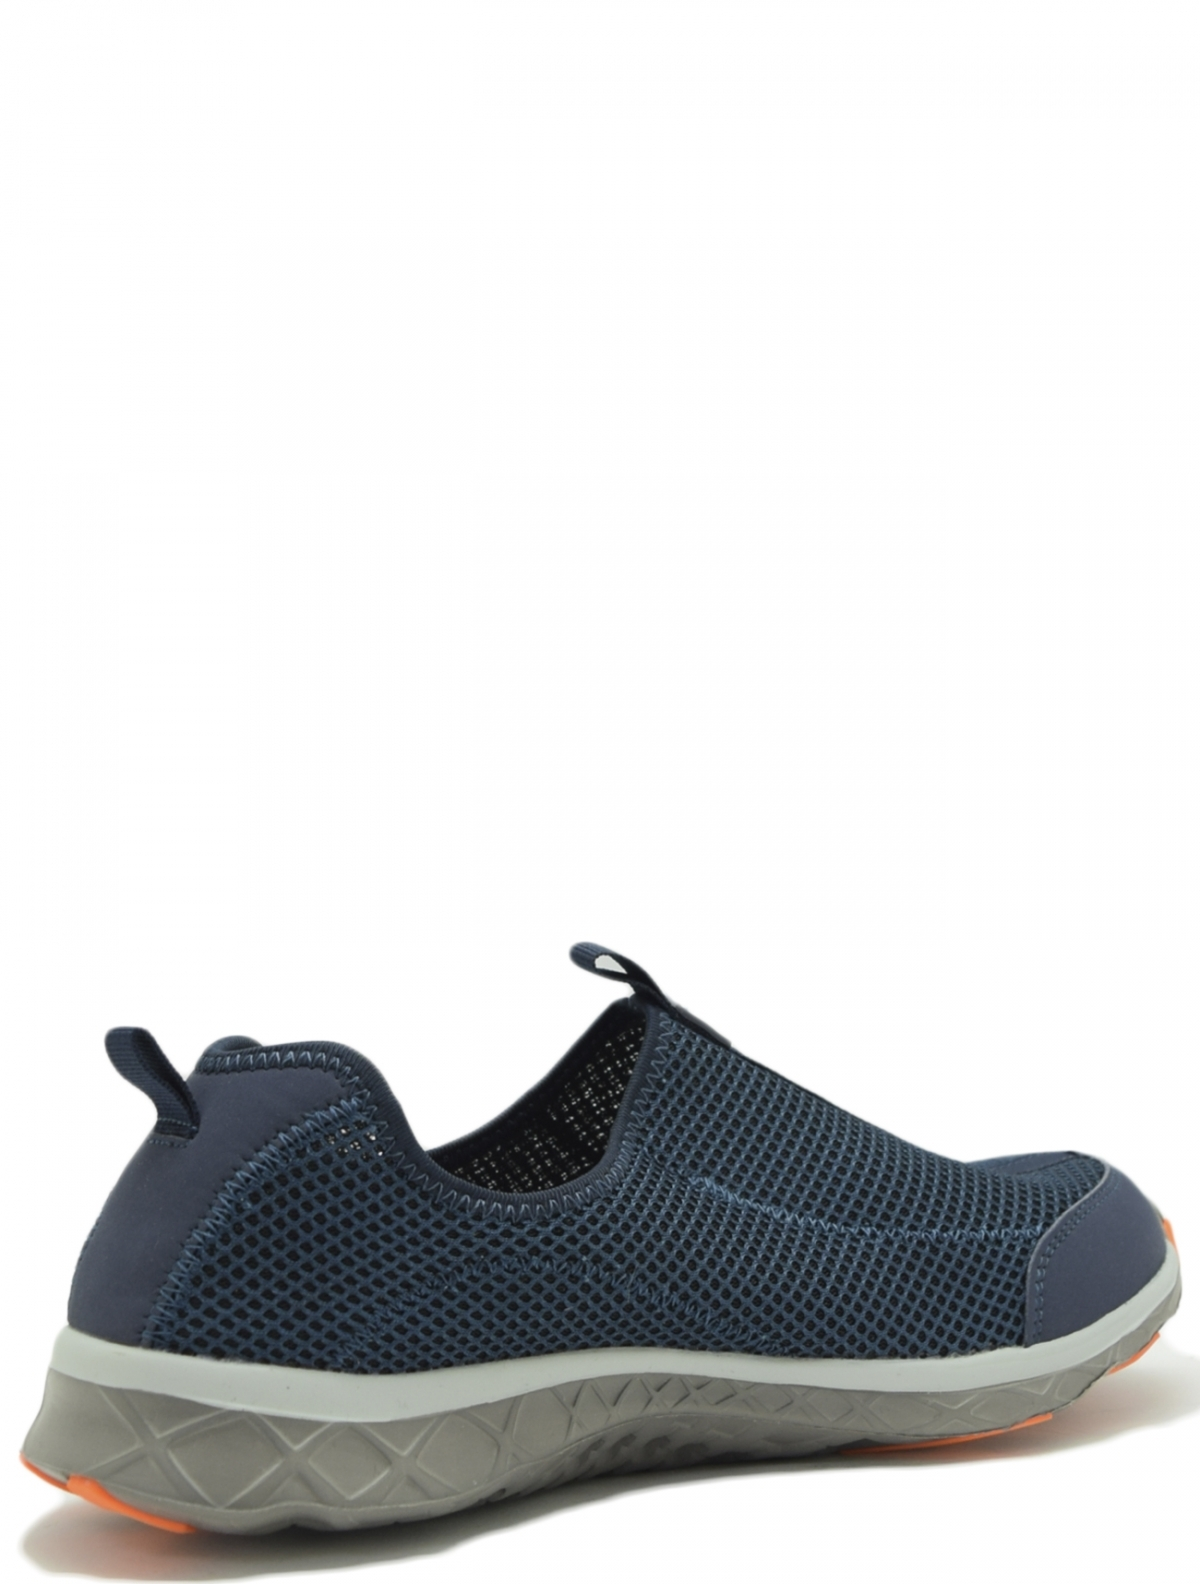 CROSBY 497012/01-03 мужские кроссовки